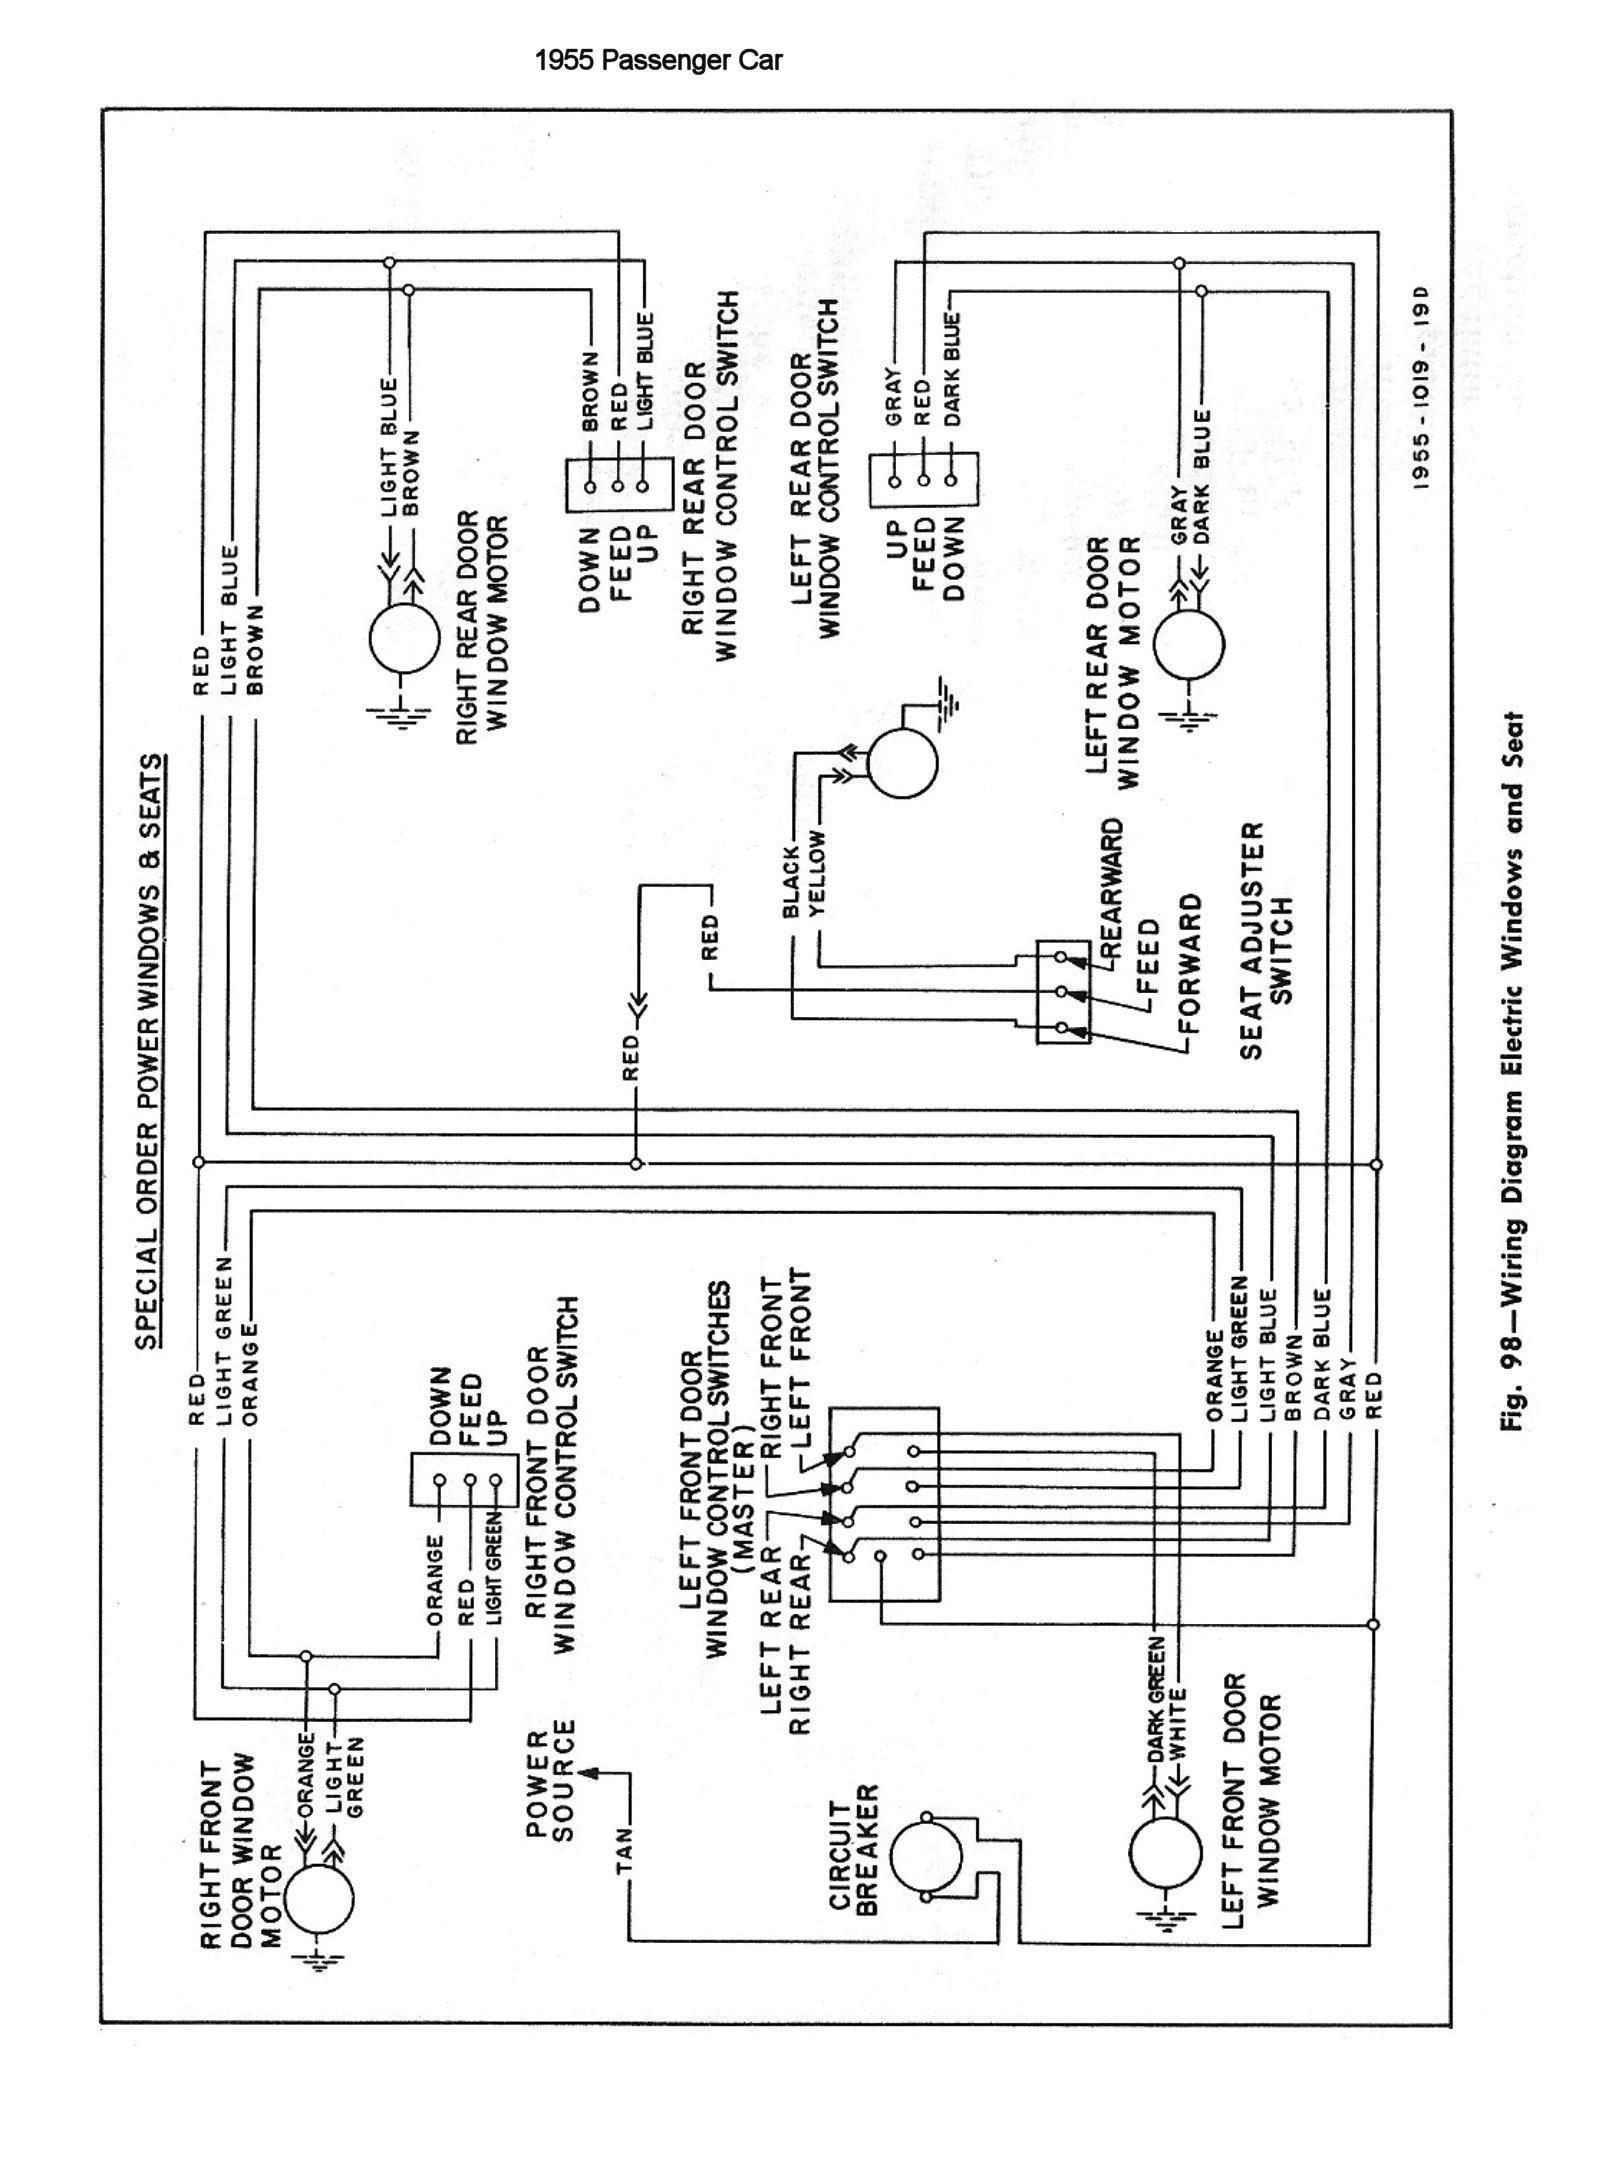 1956 corvette wiring diagram chevy wiring diagrams site wiring diagram data  chevy wiring diagrams site wiring